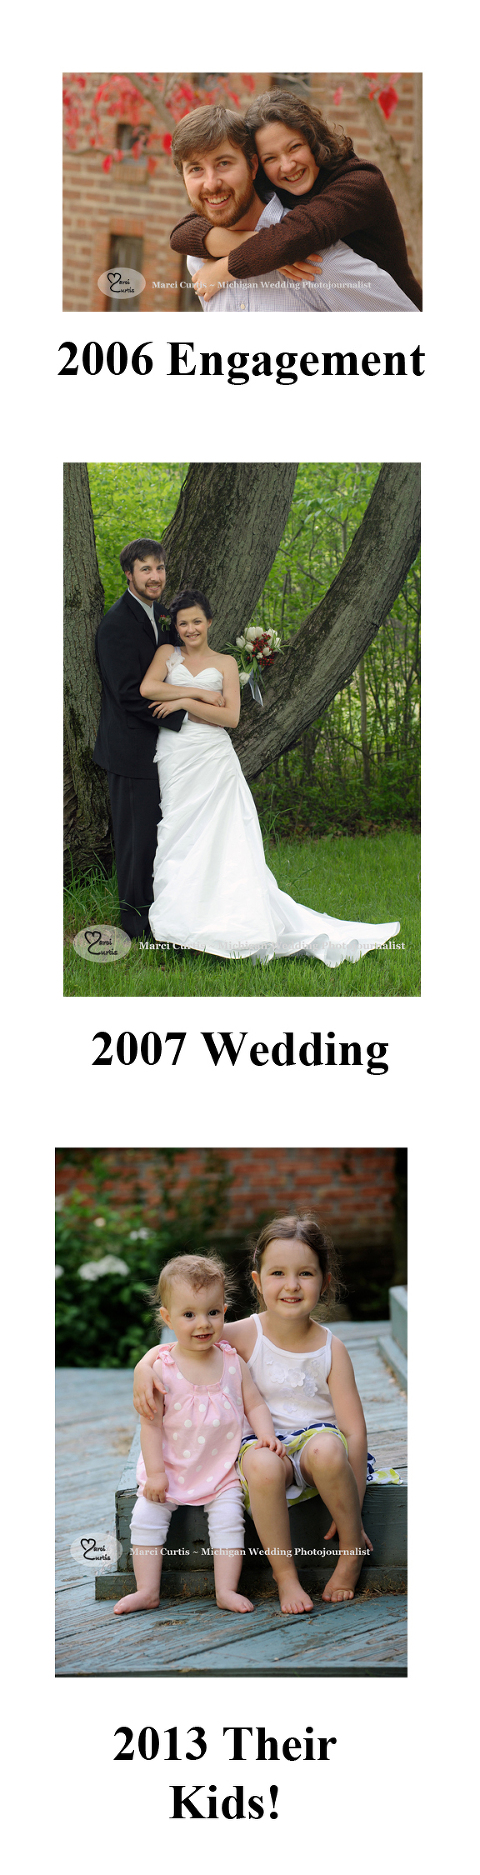 Michigan wedding photographer showcases engagement, wedding and family photos